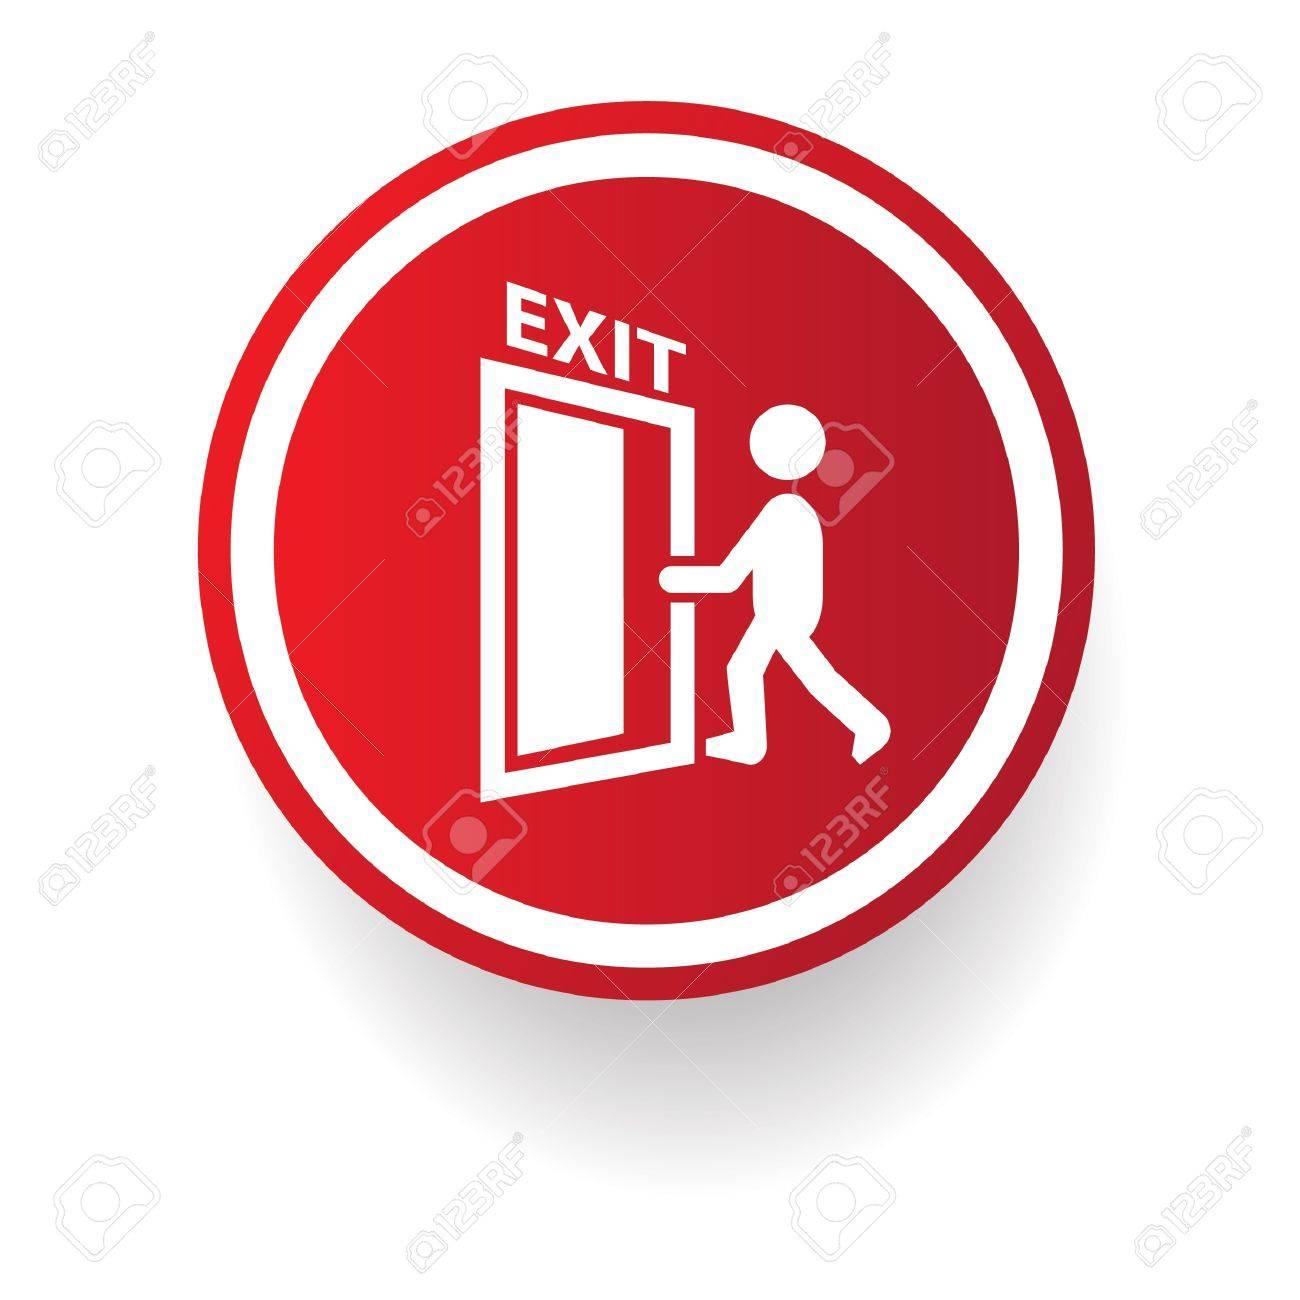 Exit symbol Stock Vector - 20438253